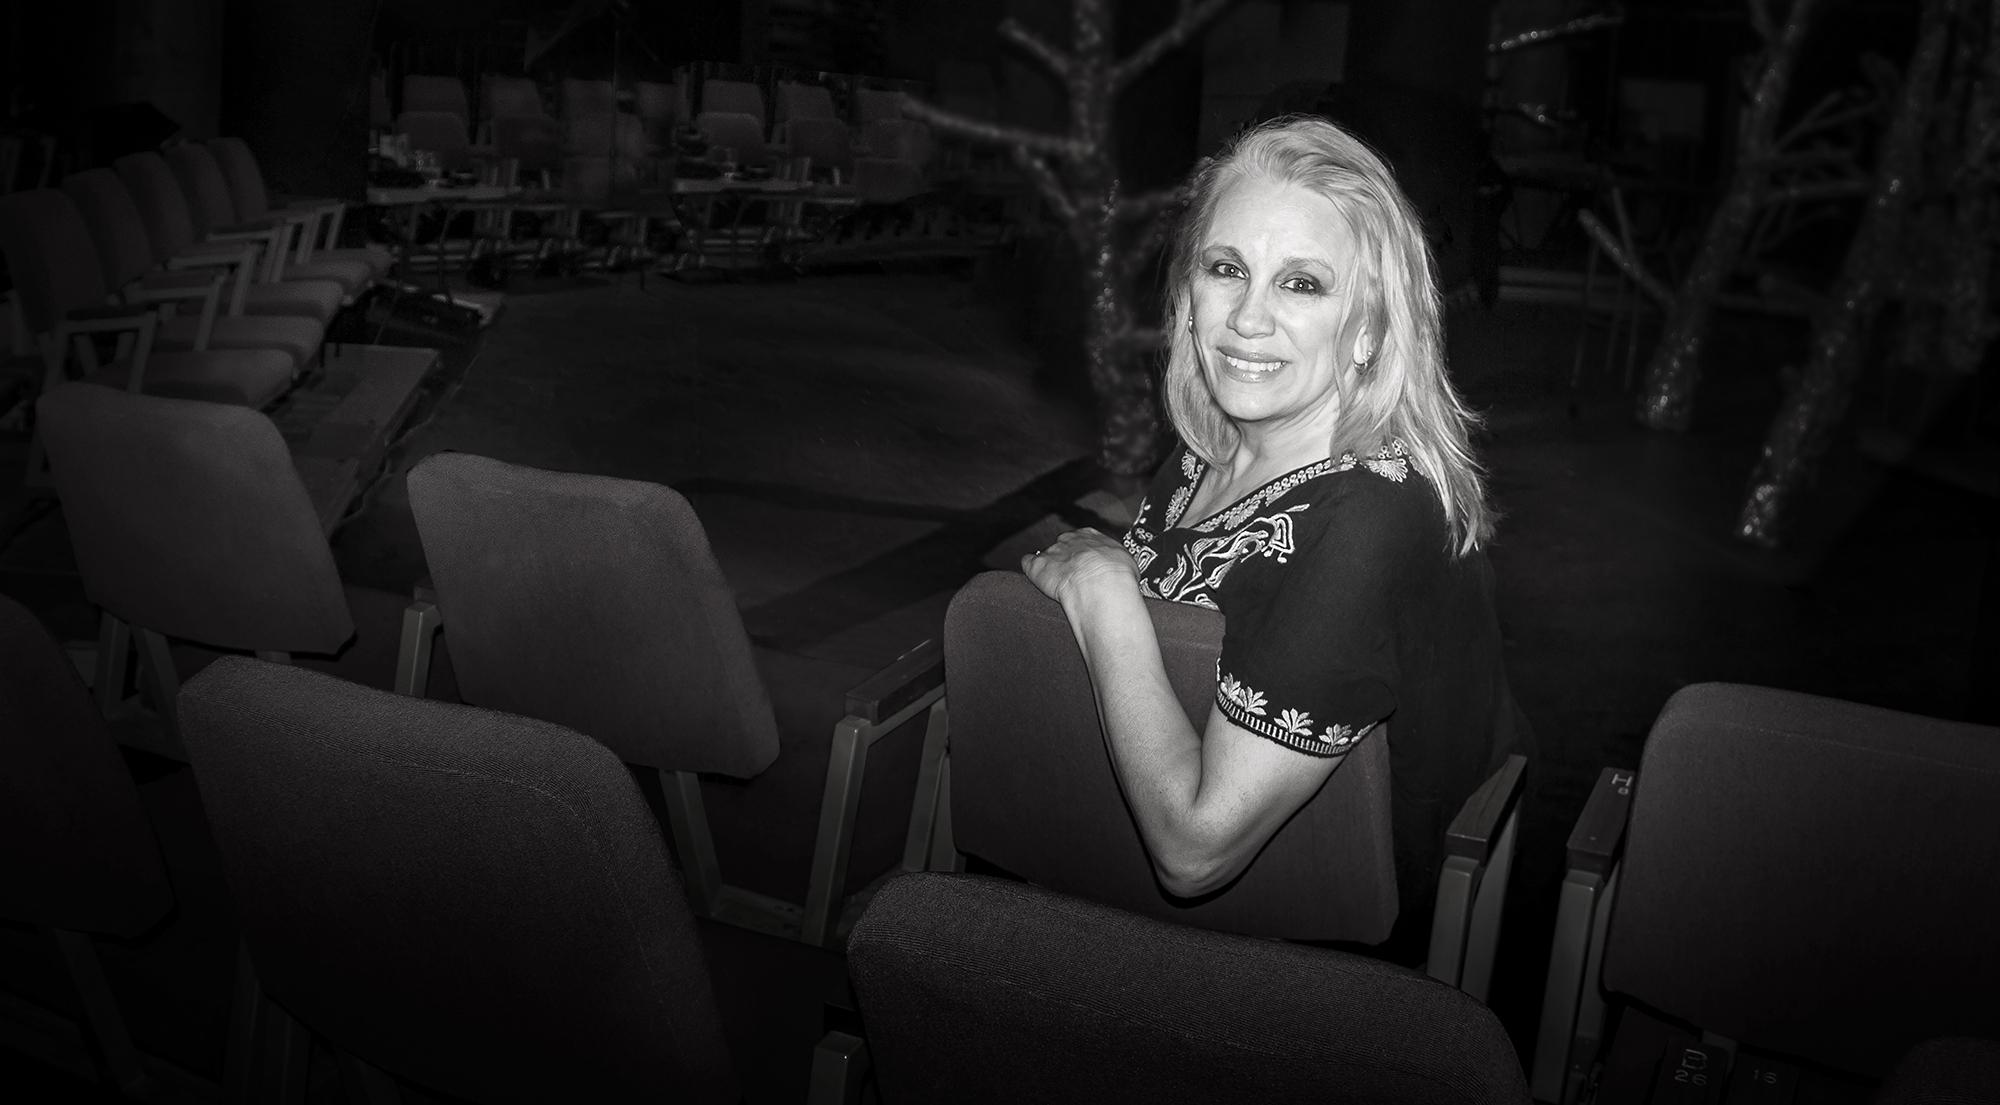 kathErine owens - Founding Artist Director